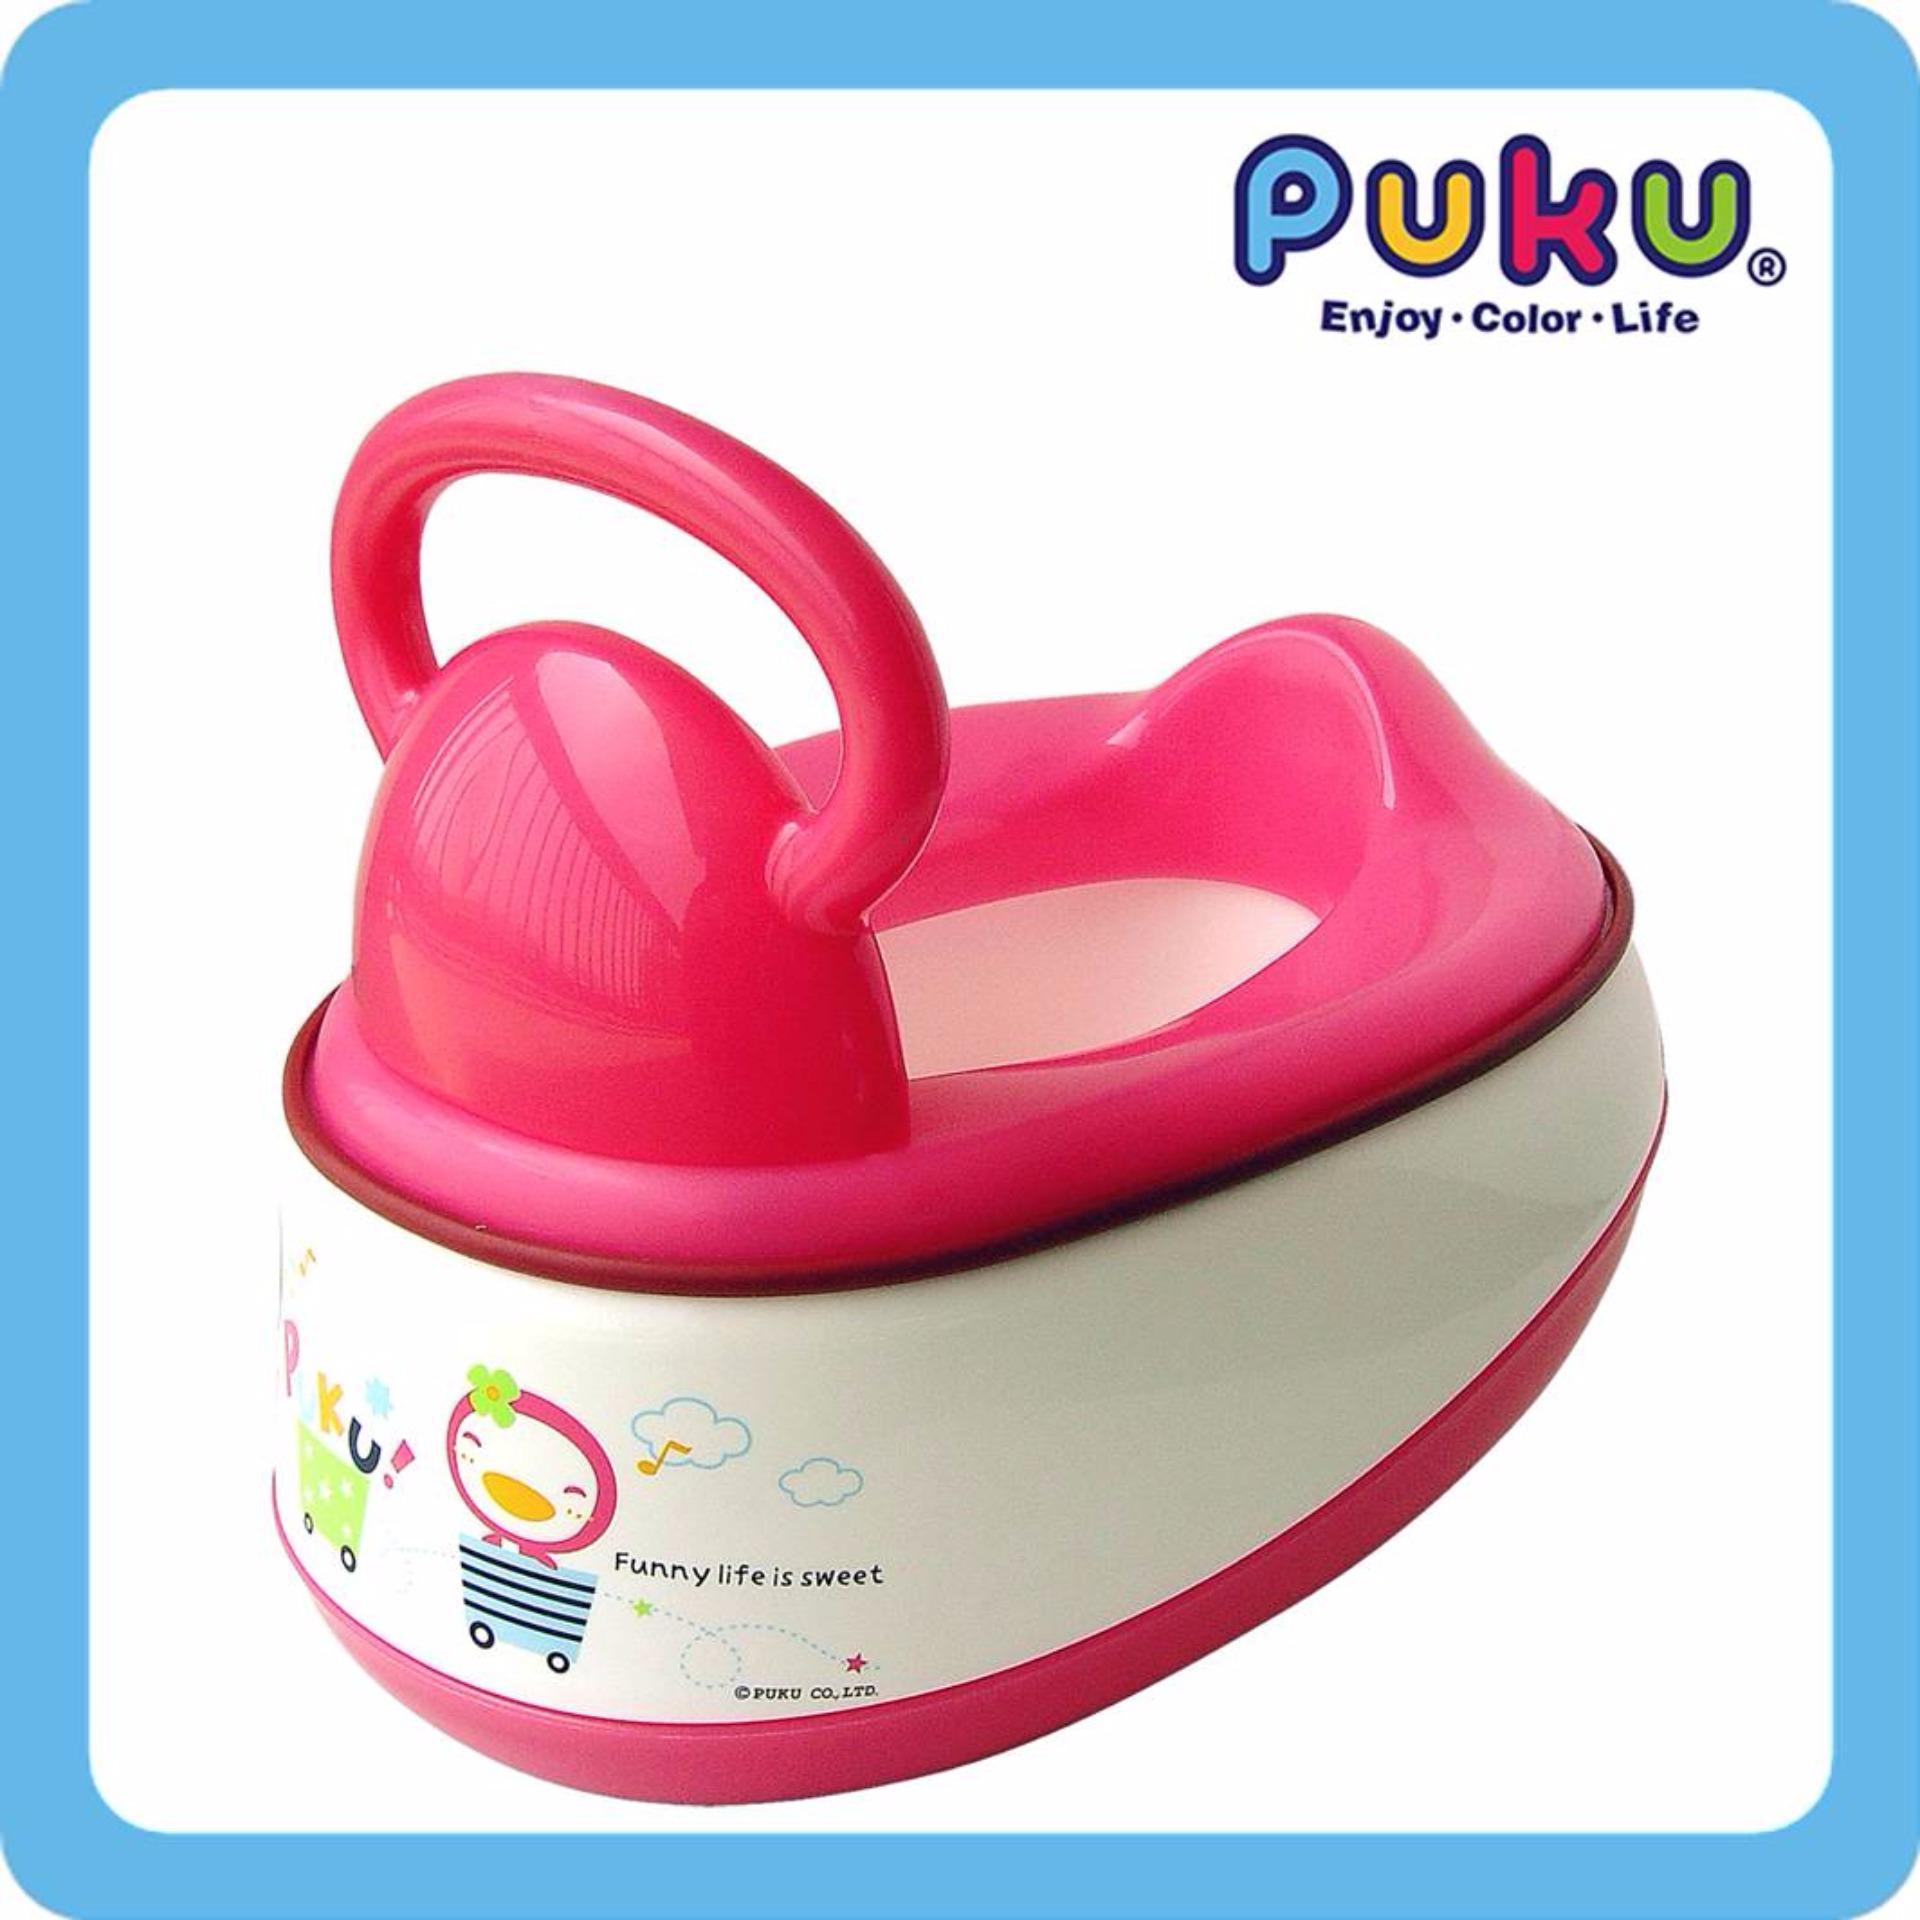 Retail Price Puku 5 In 1 Baby Potty Pink